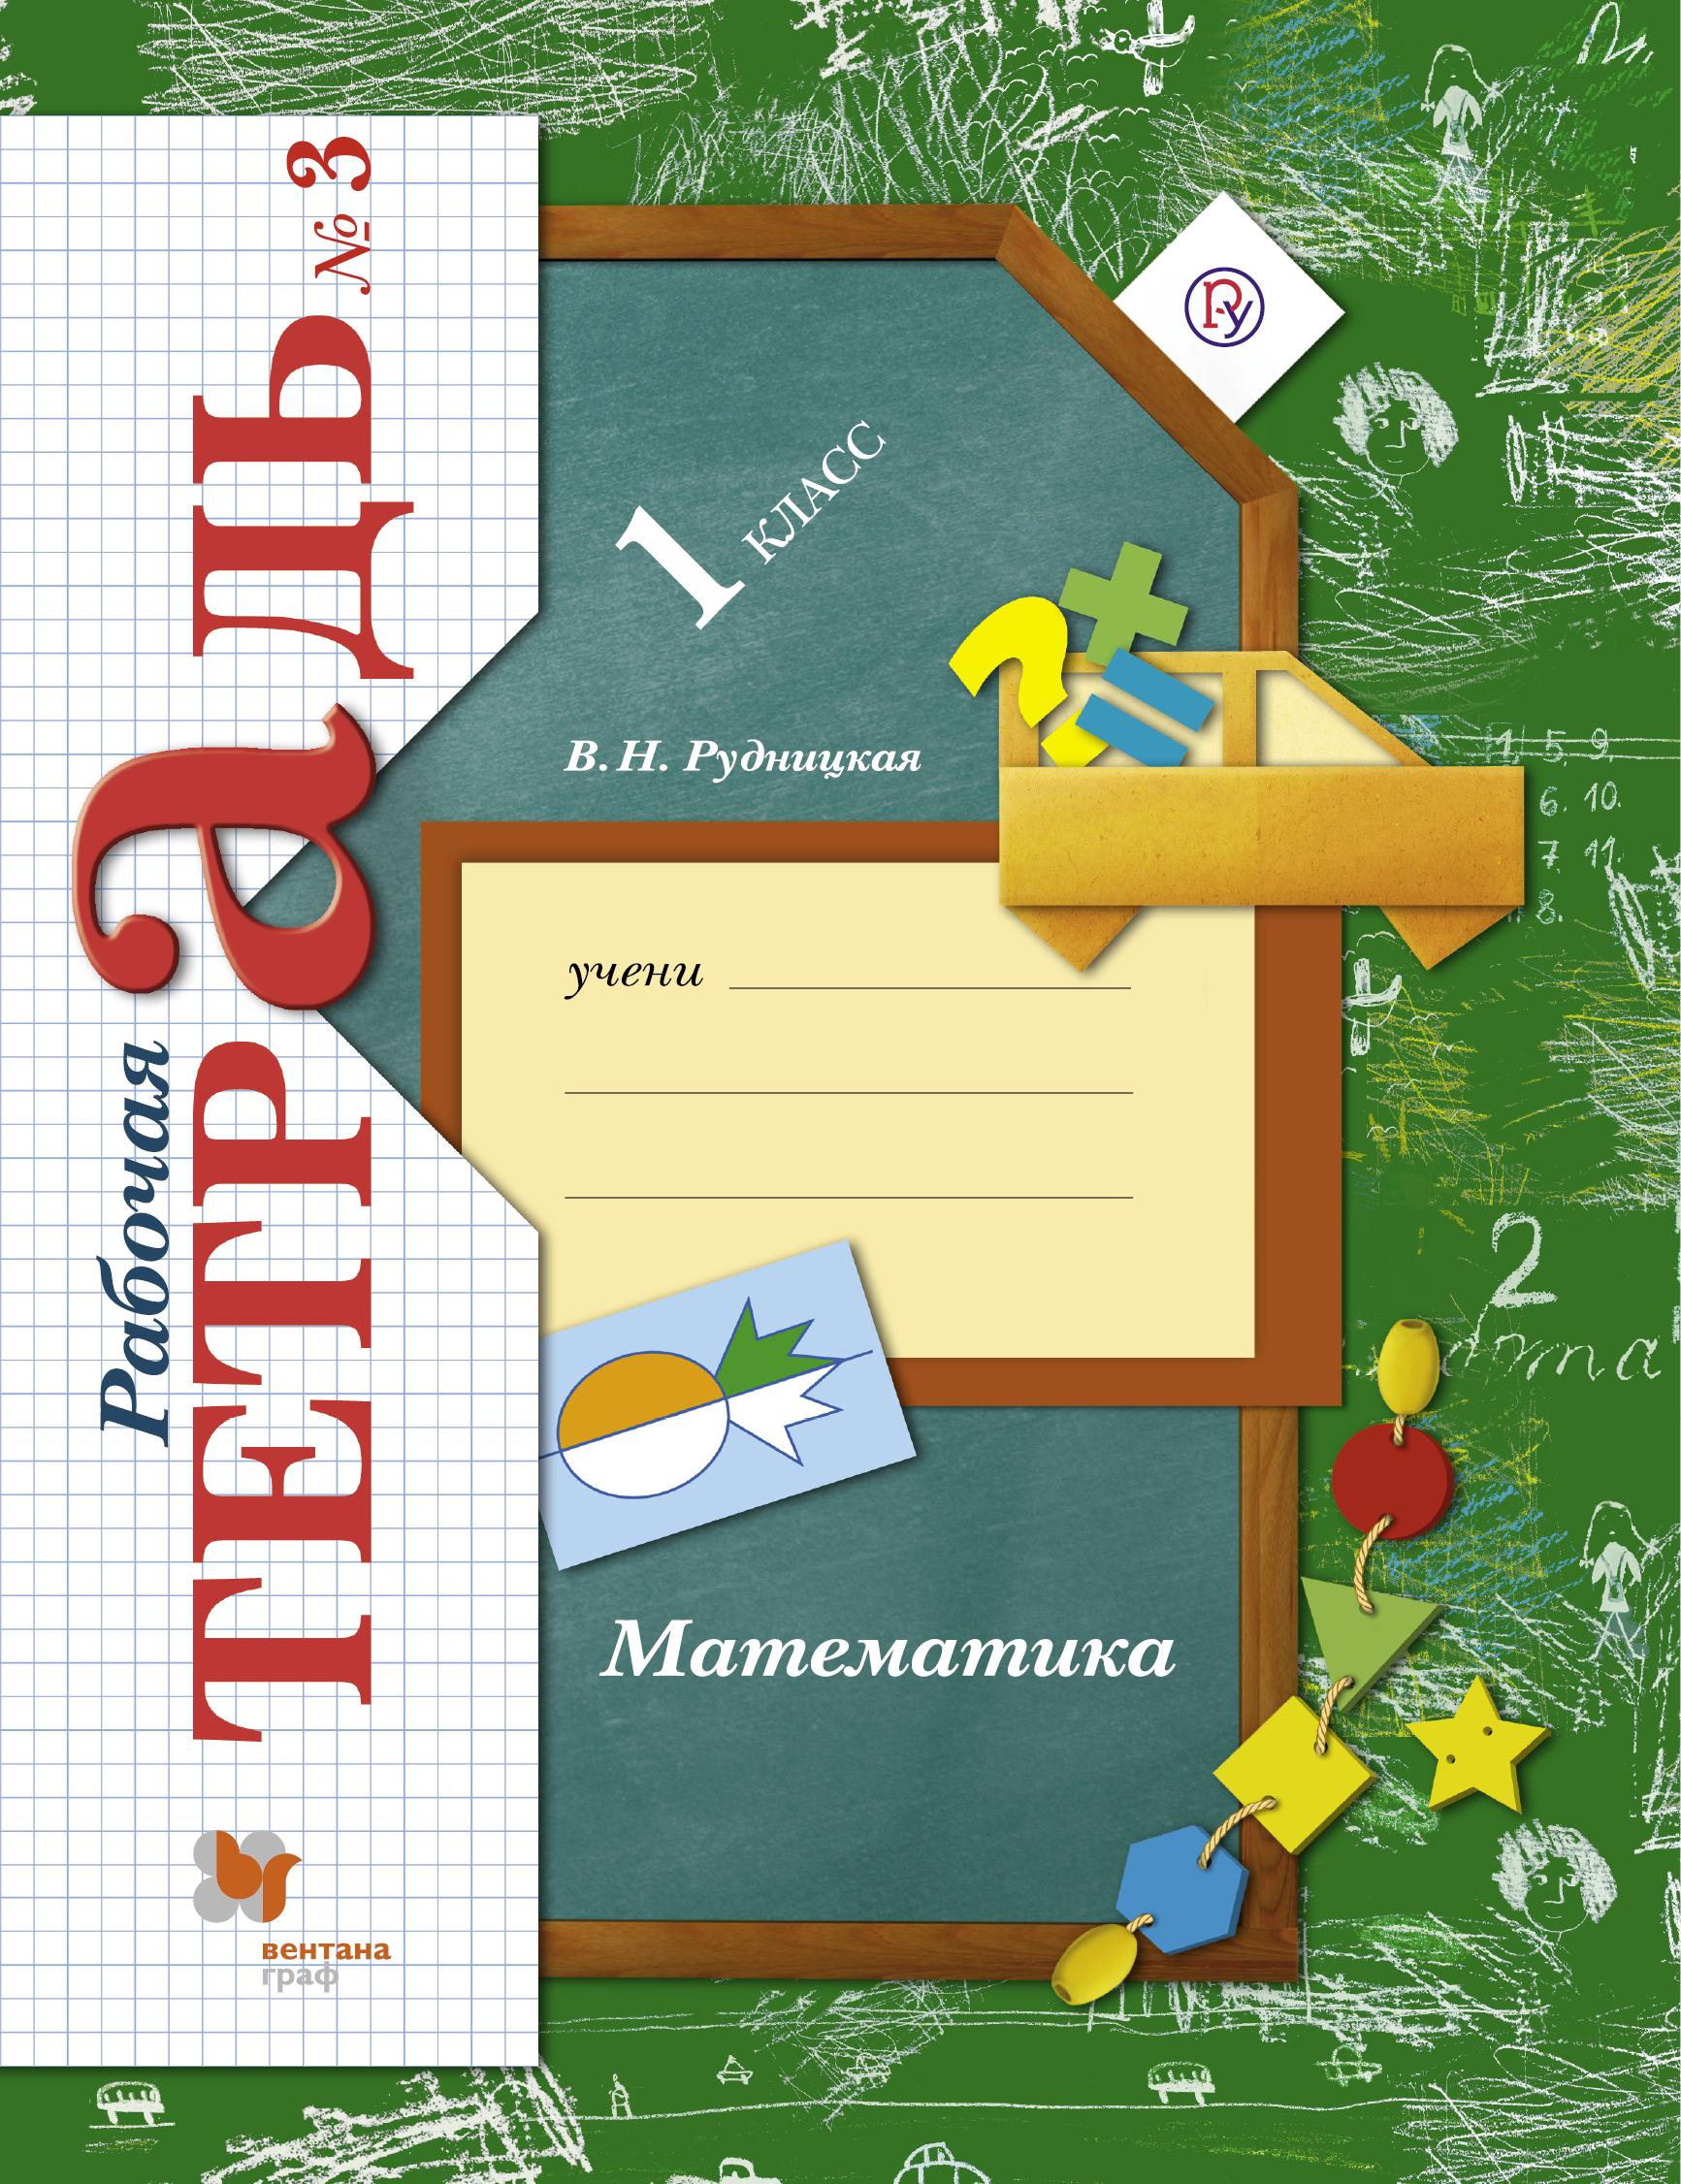 РудницкаяВ.Н. Математика. 1класс. Рабочая тетрадь №3.